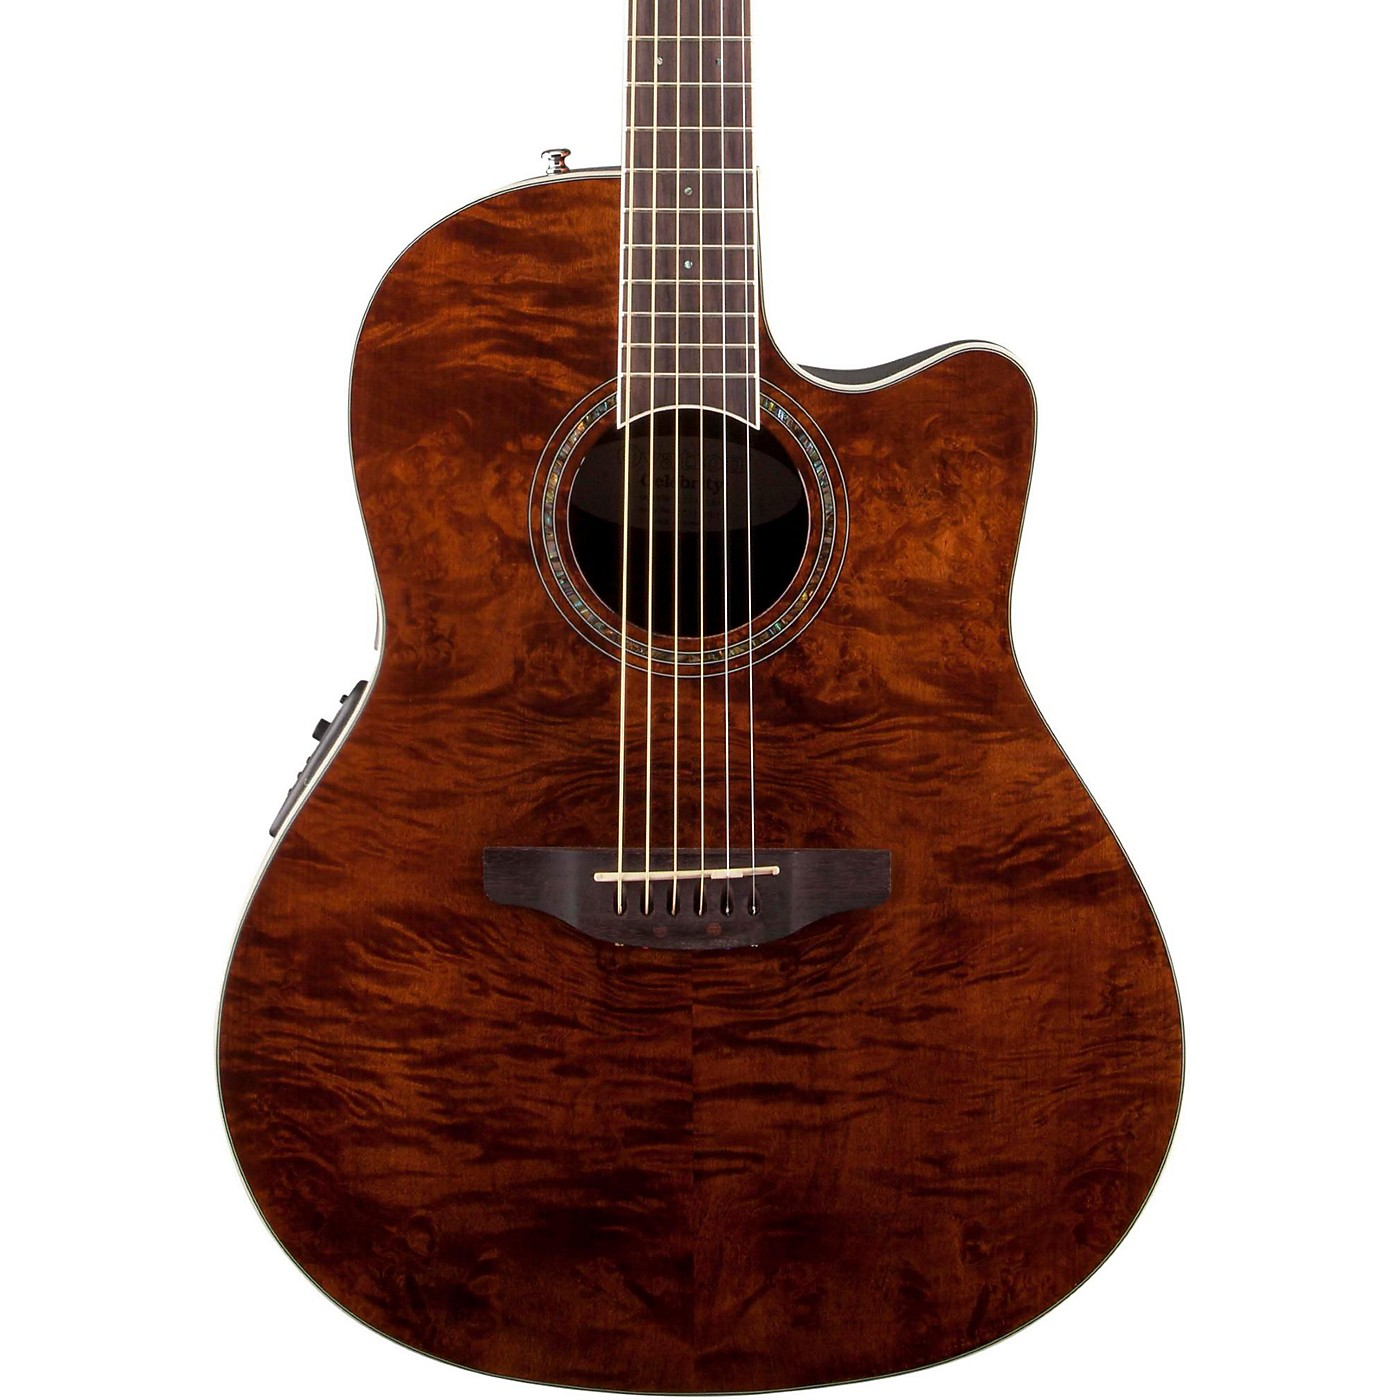 Ovation Celebrity Standard Plus Mid Depth Cutaway Acoustic-Electric Guitar thumbnail